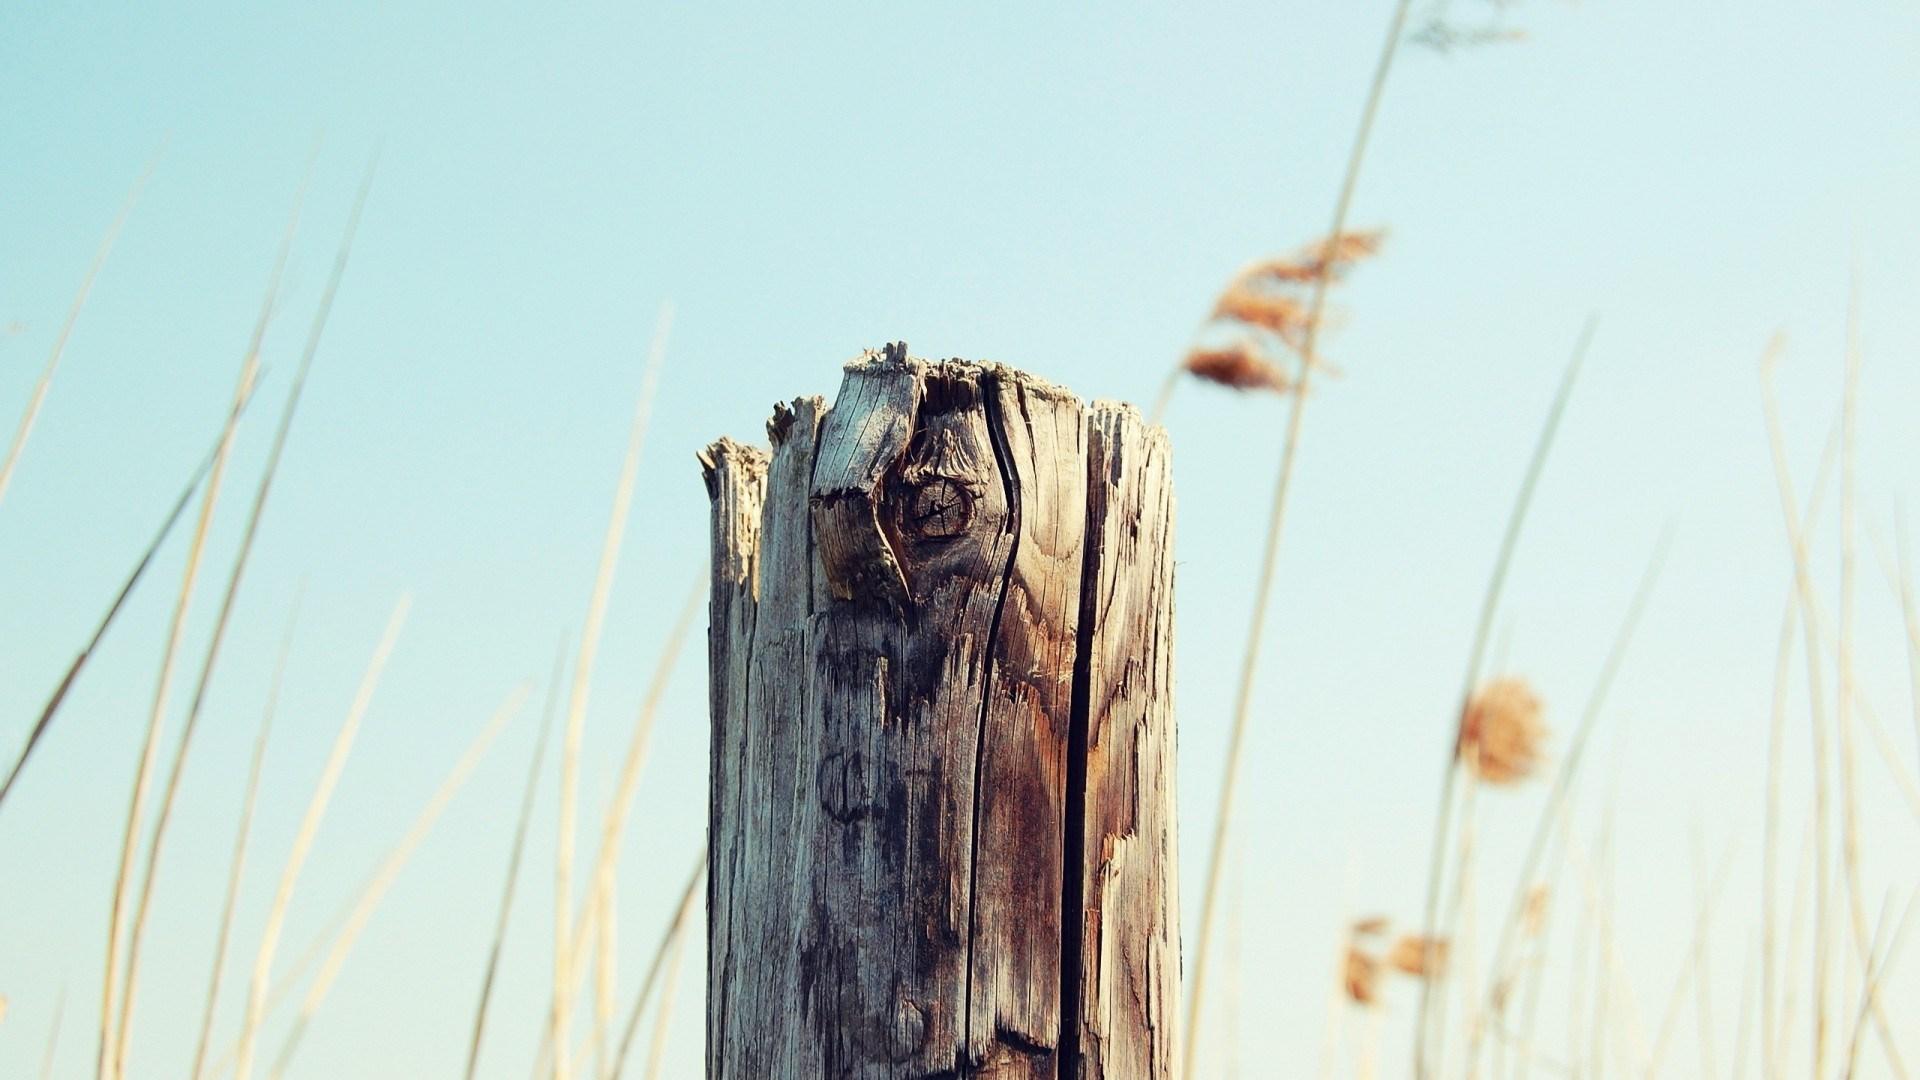 Tree Stump Nature